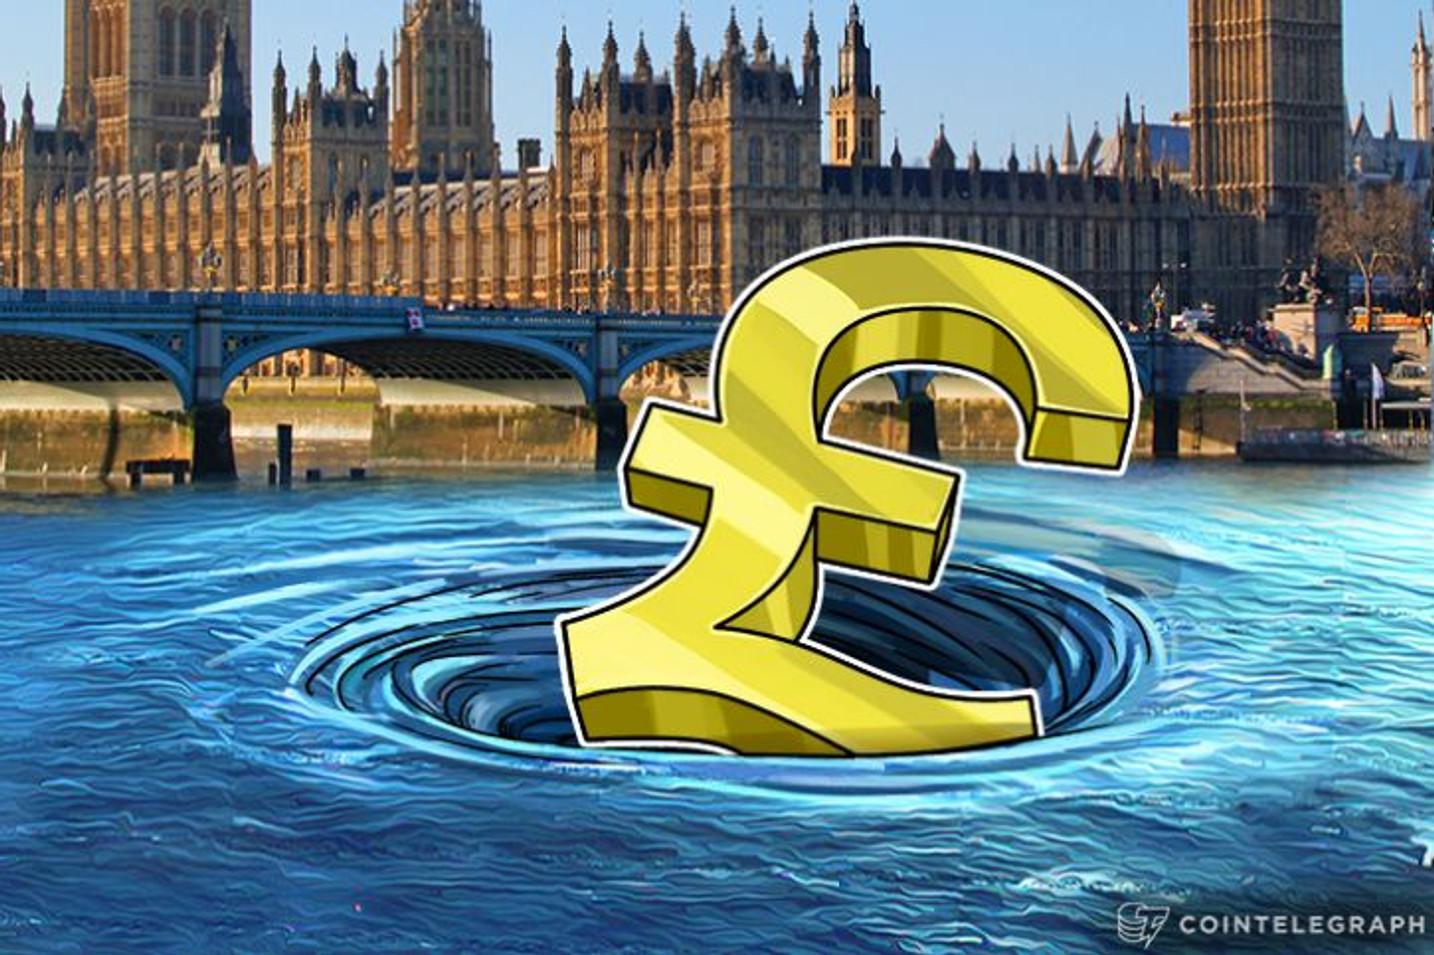 Kako britanska funta nastavlja da pada, nestabilnost bitkoina se dovodi u pitanje